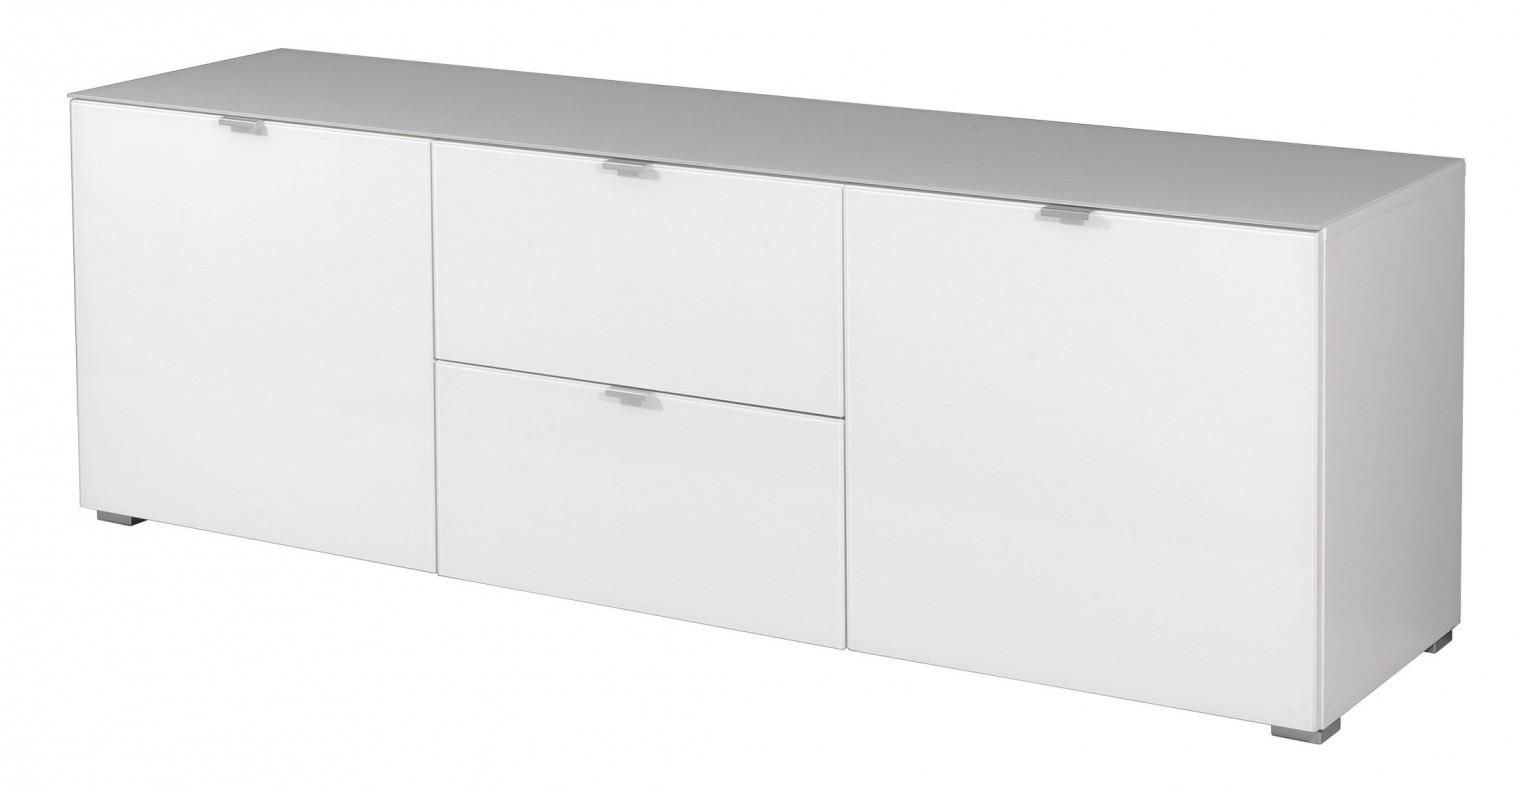 Komoda GW-Primera - skříňka, 2x dveře, 2x šuplík (bílá)